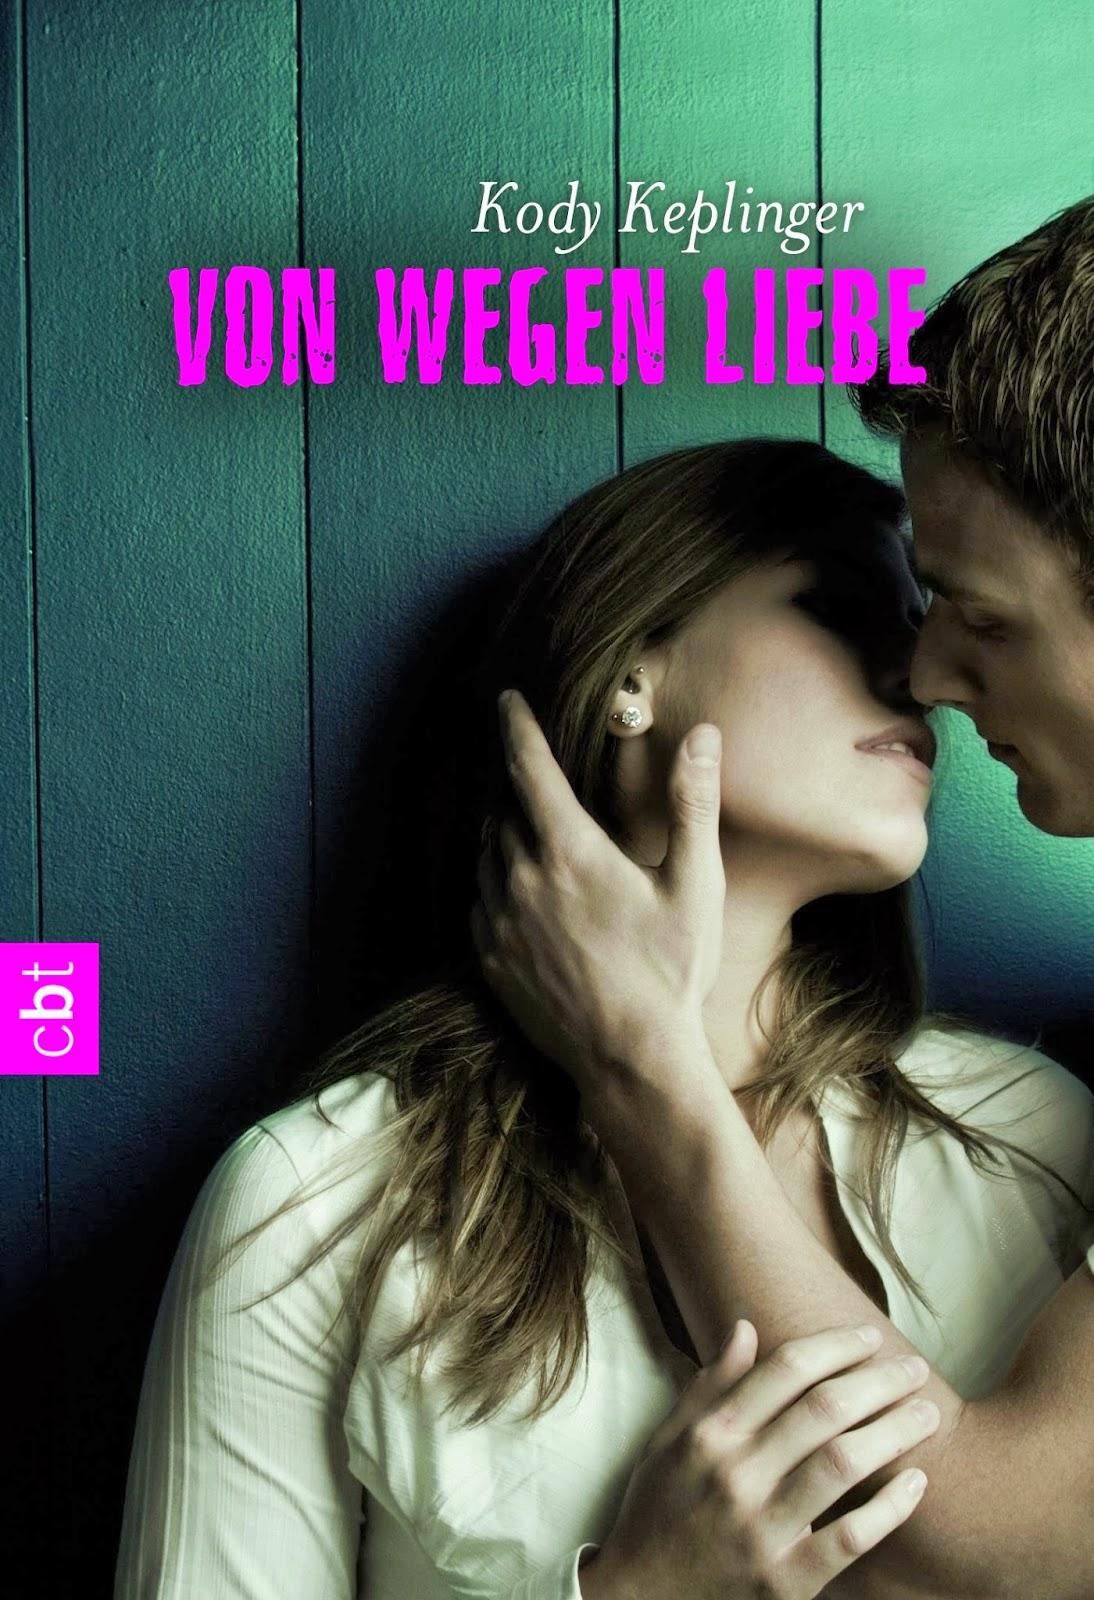 http://www.randomhouse.de/content/edition/covervoila_hires/Keplinger_KVon_wegen_Liebe_128119.jpg